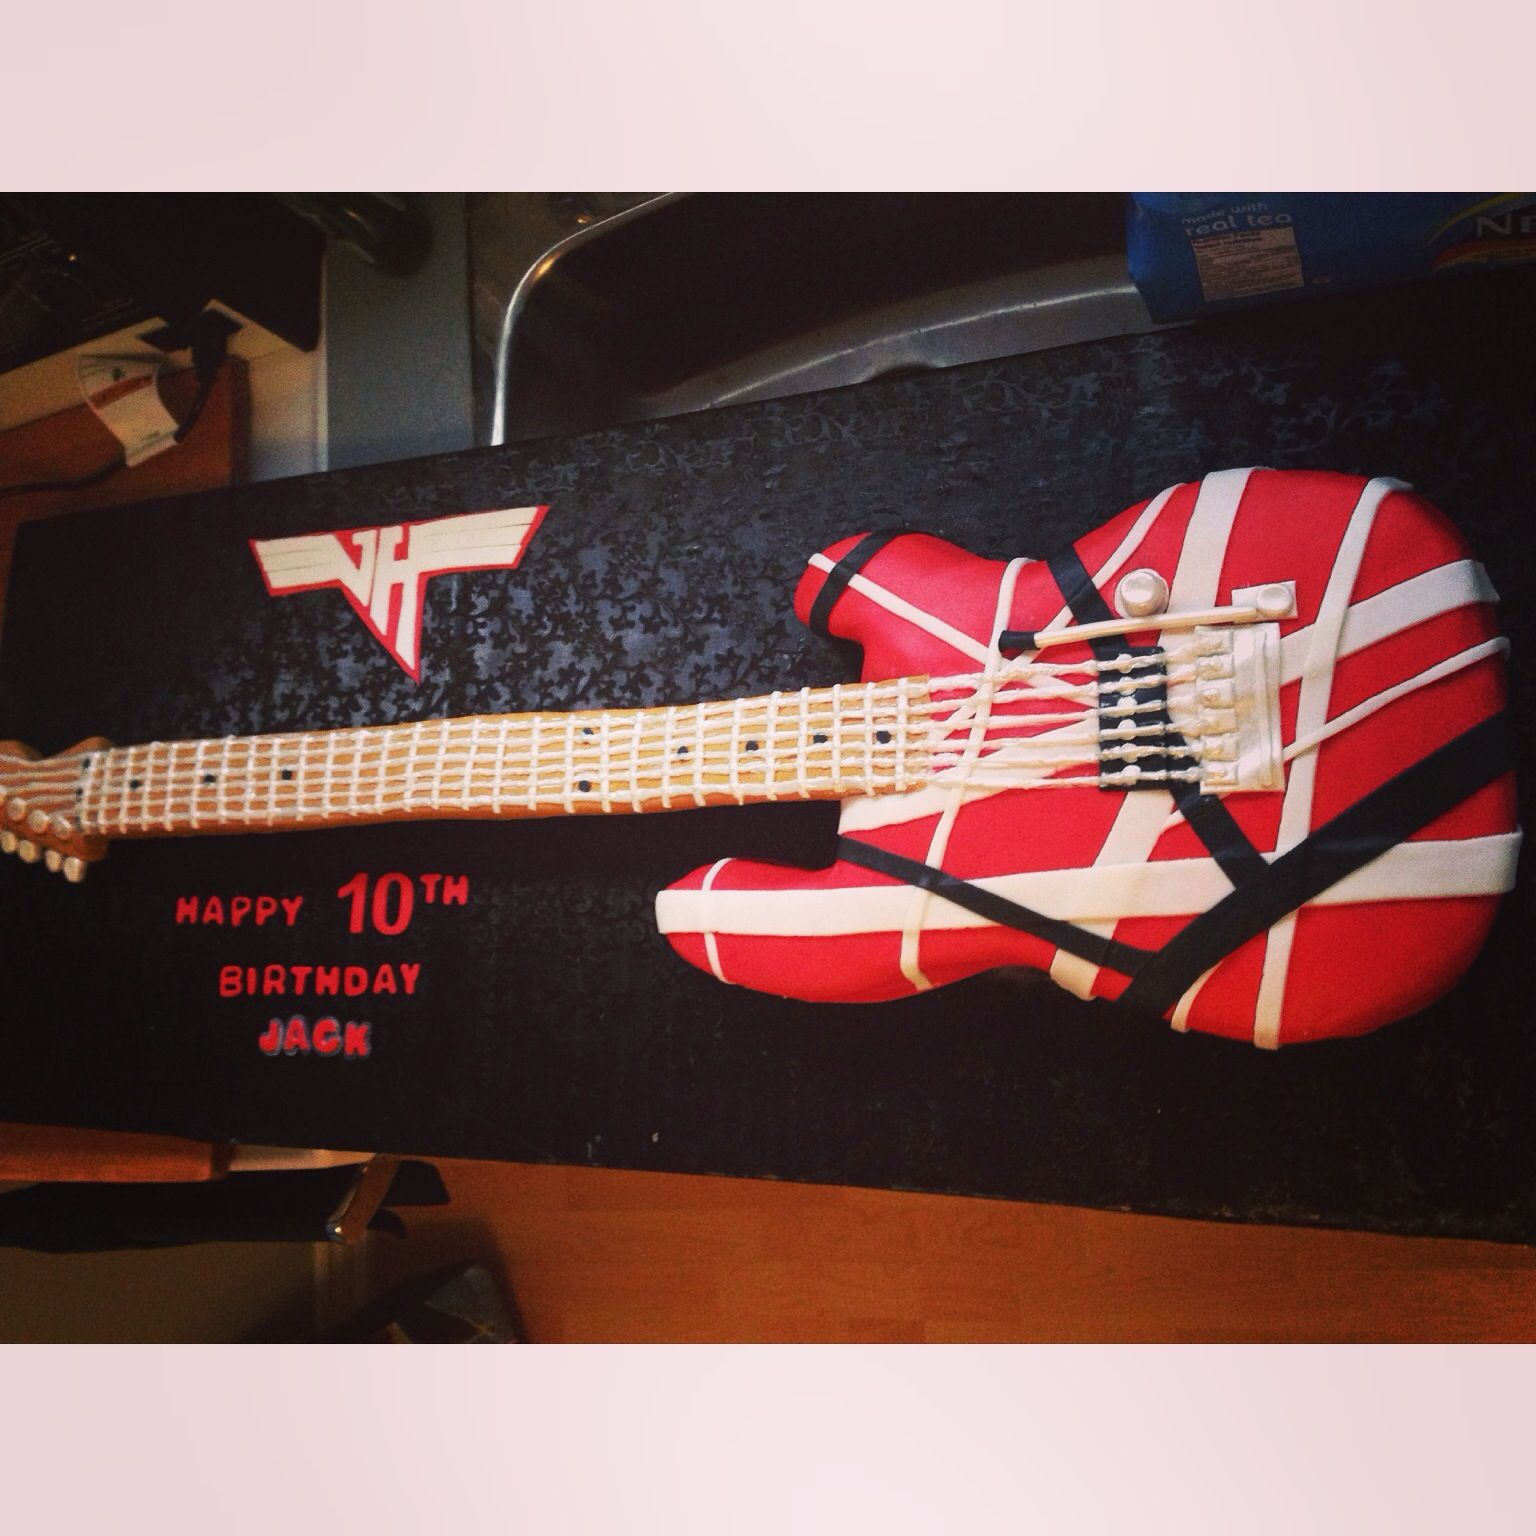 Van Halen Cake Happy 10th Birthday Party Themes 10th Birthday